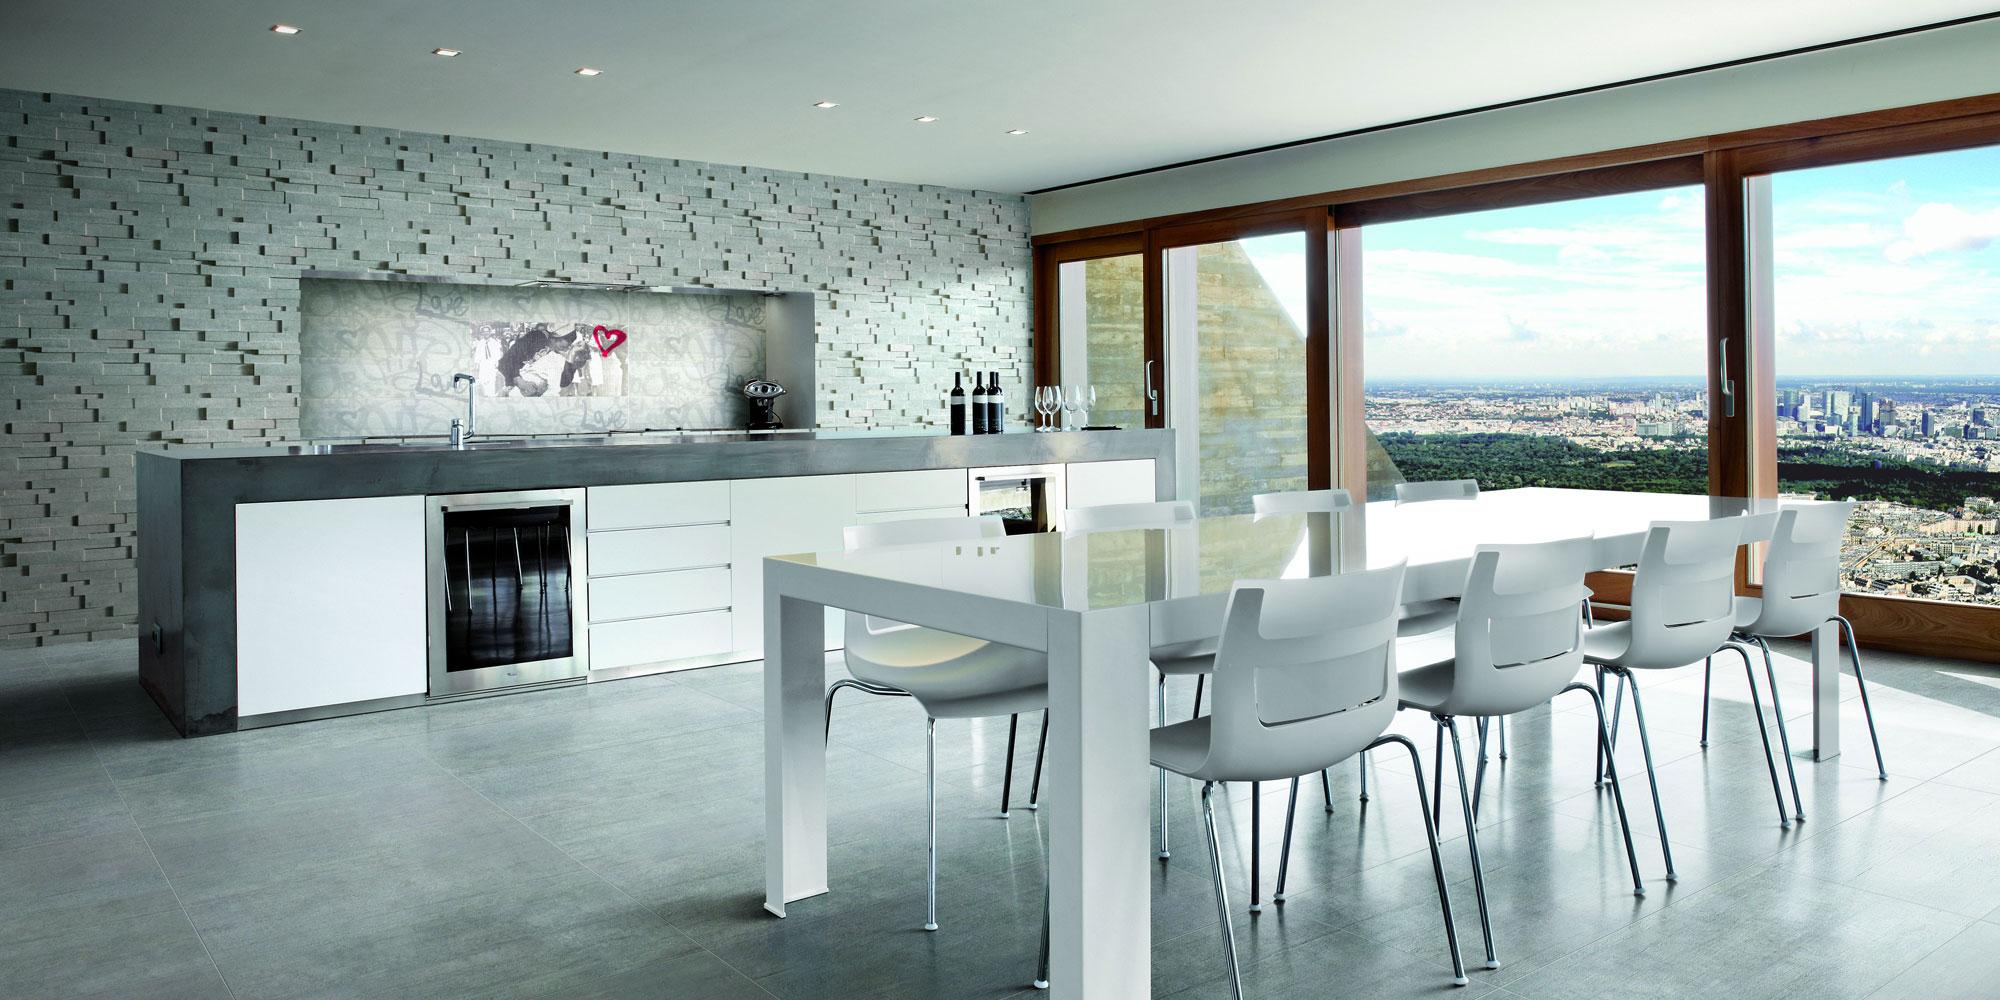 premium fliesen bodenfliesen betonoptik modern holzoptik 48x97cm grau kalibriert. Black Bedroom Furniture Sets. Home Design Ideas